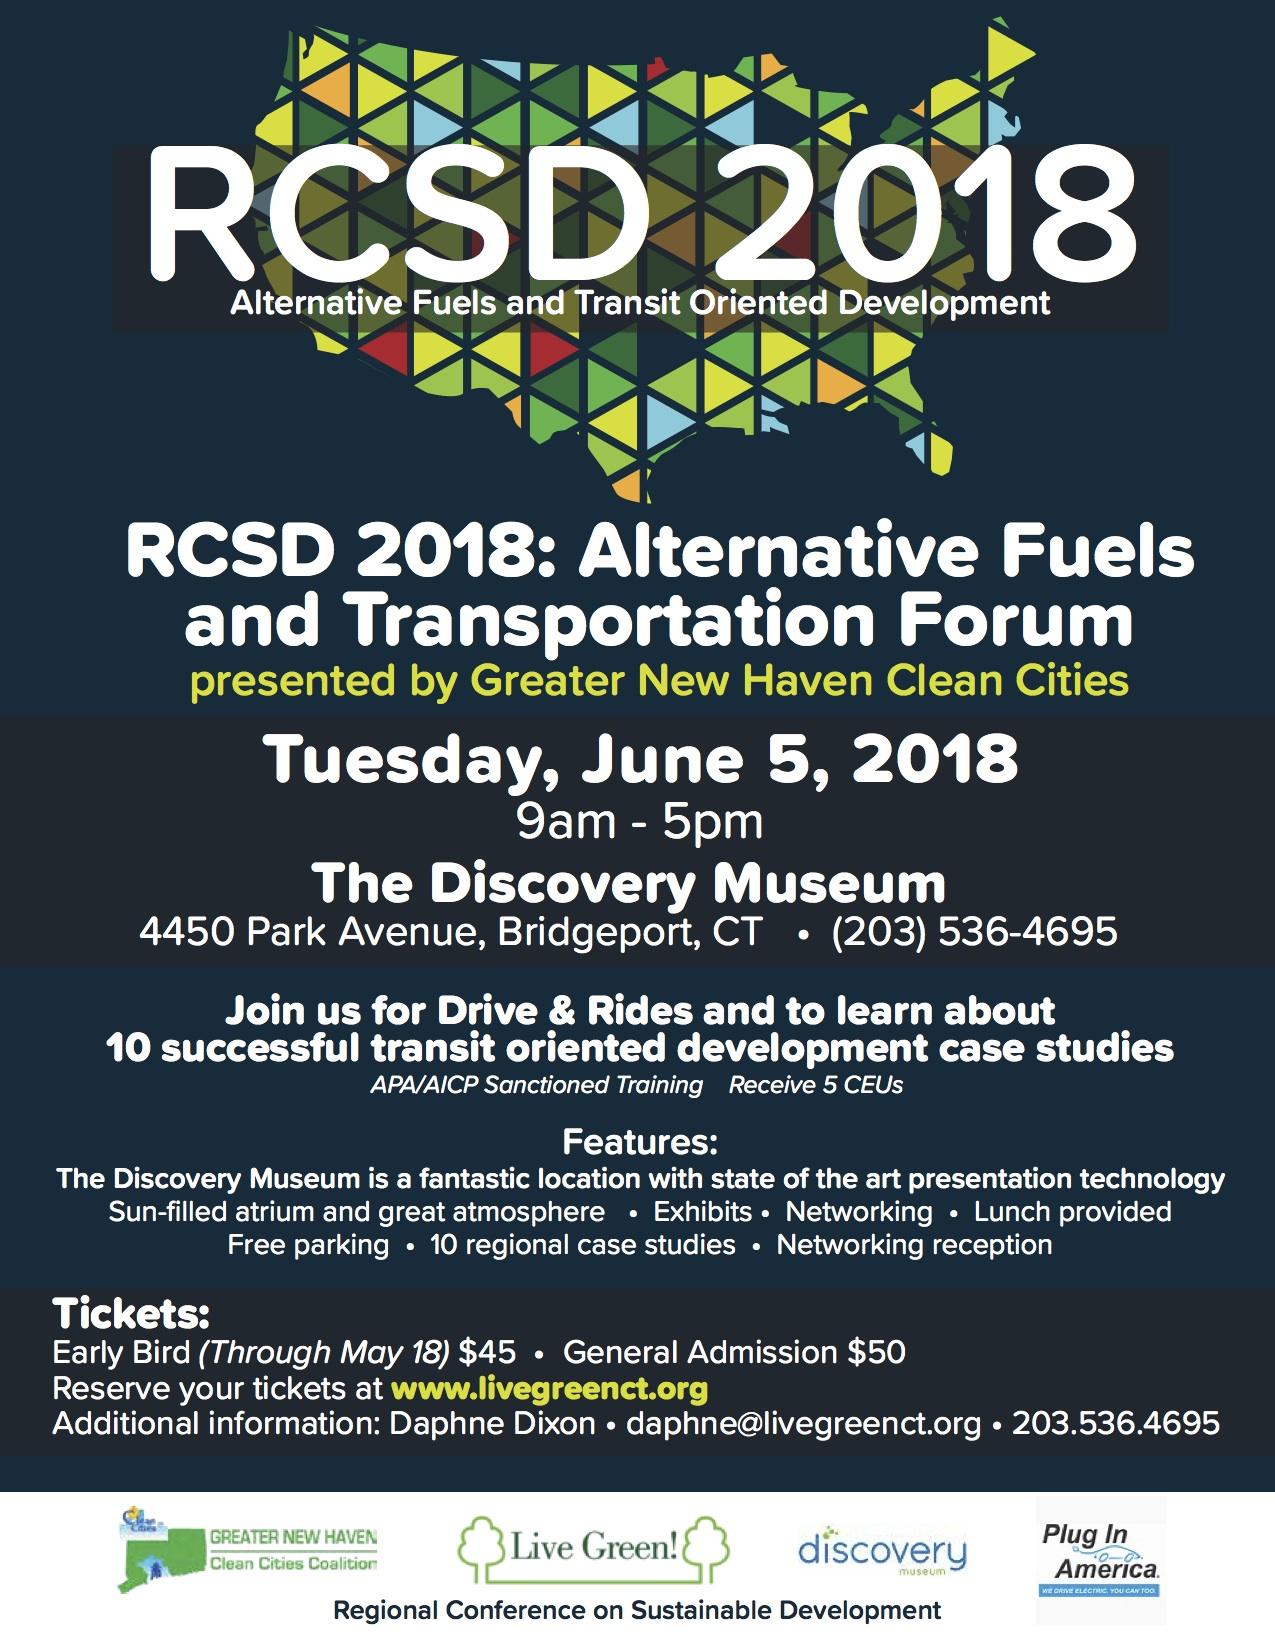 "<a href=""https://www.eventbrite.com/e/rcsd-2018-alternative-fuels-transportation-forum-tickets-45787483596""></a>"